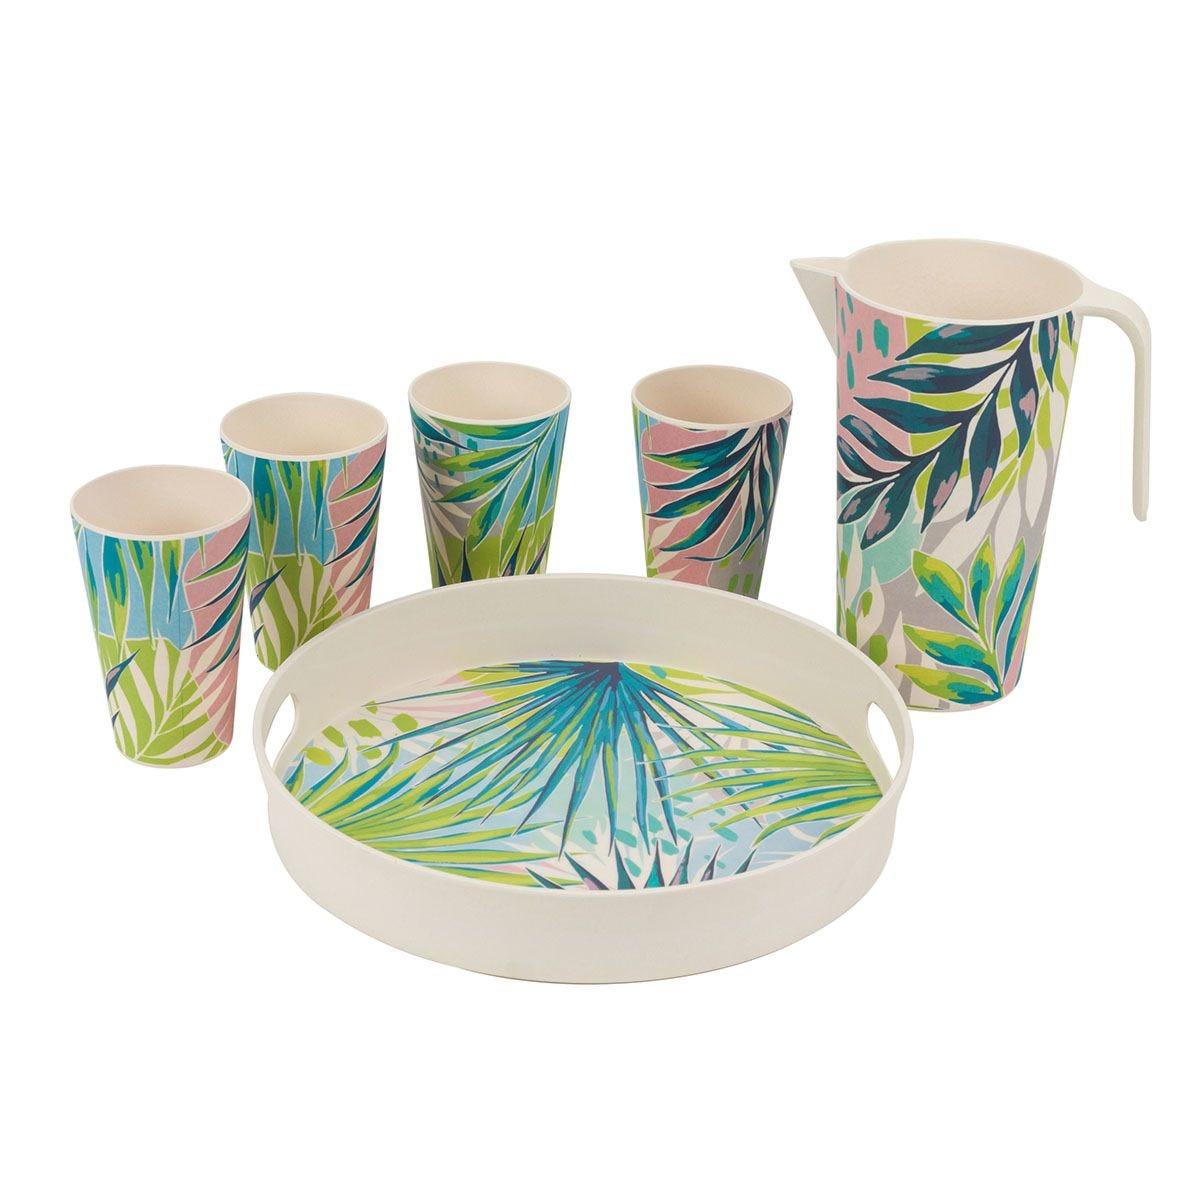 Cambridge Kayan Bamboo Eco-Friendly Tableware Set - 6 Piece